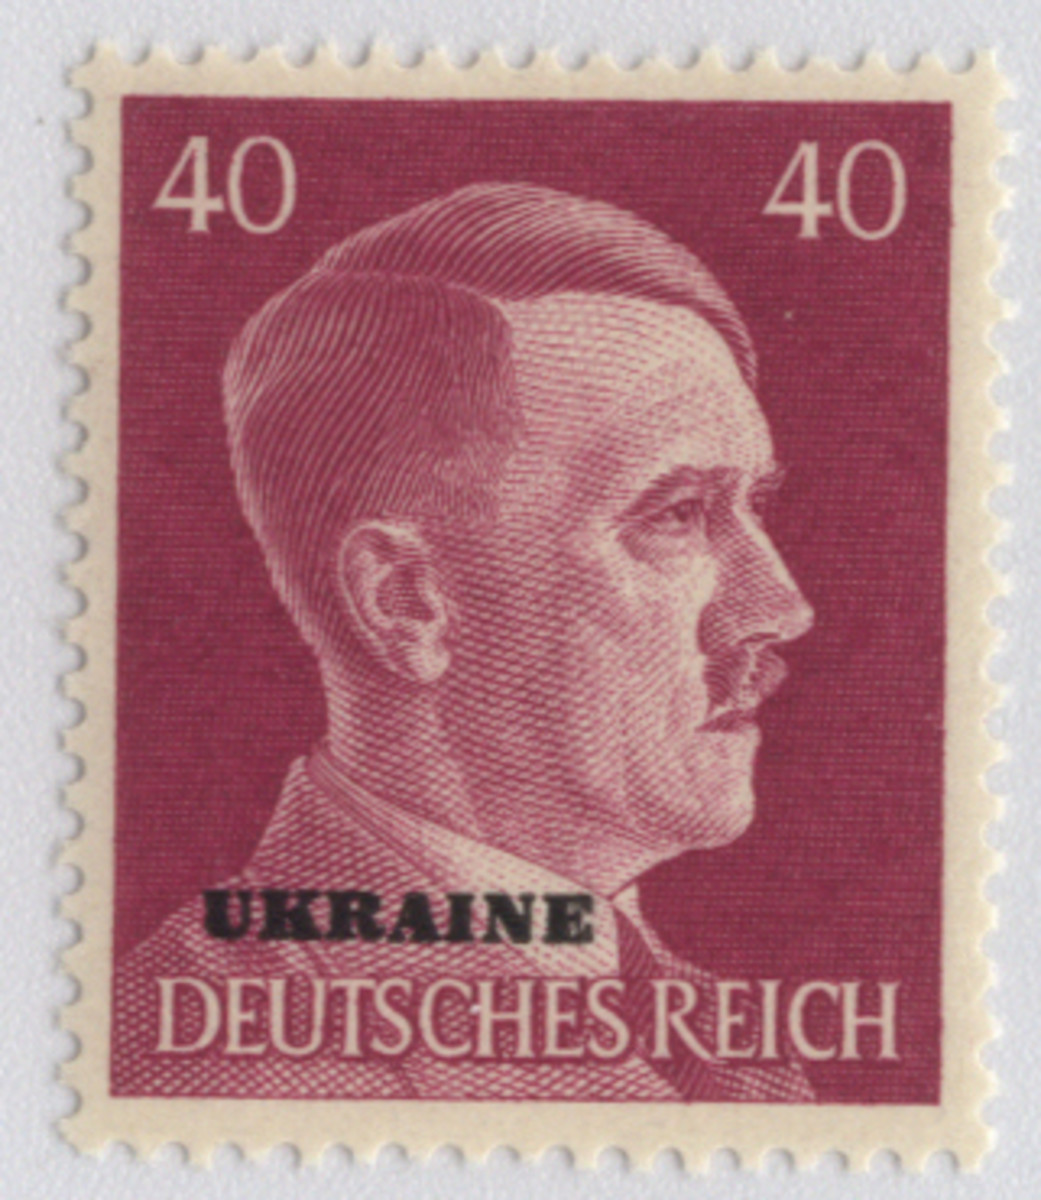 Ukrainian Stamp during World War II